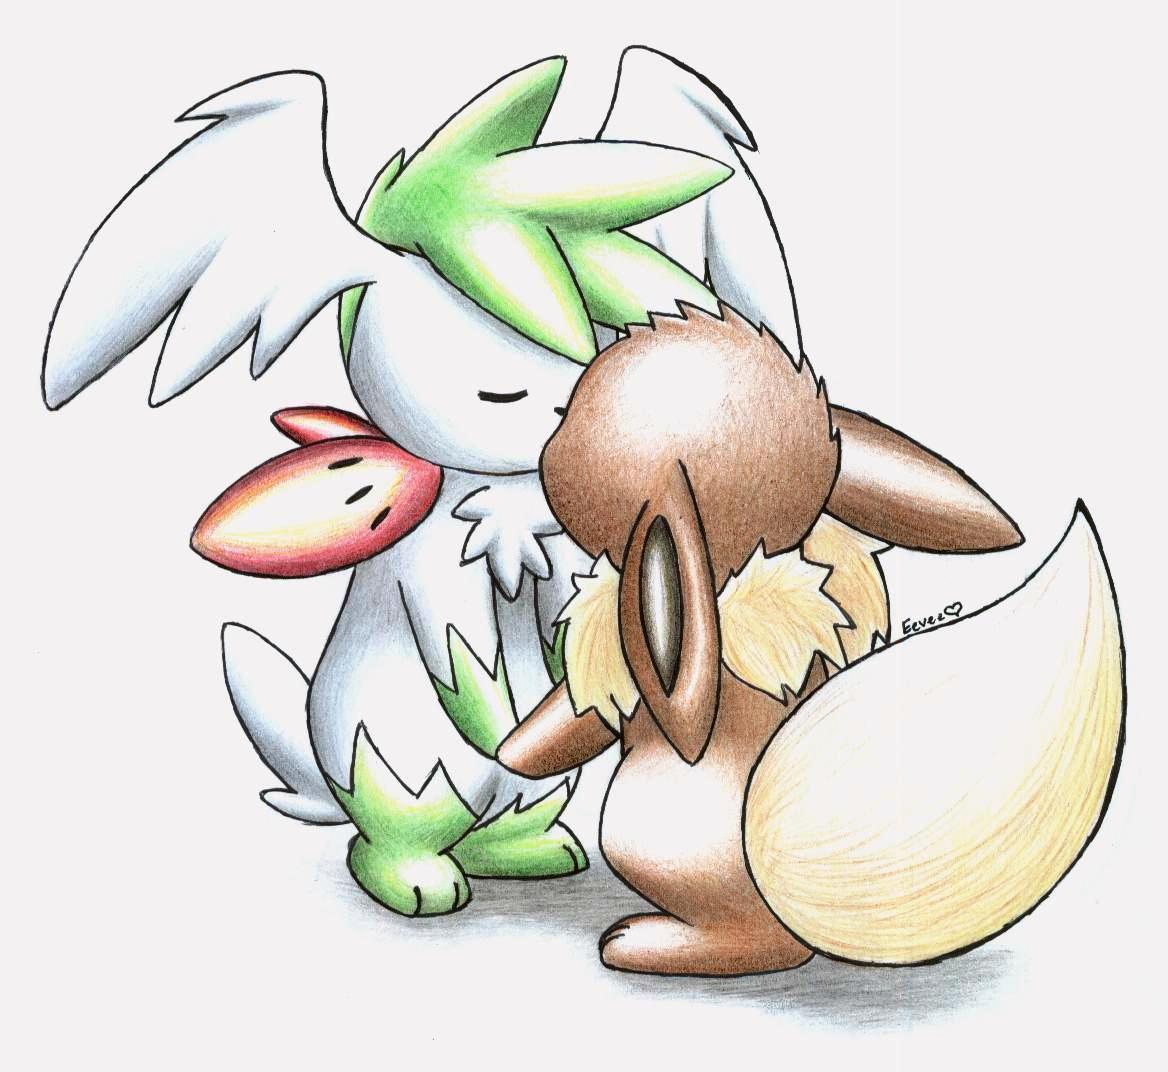 Eevee and Shaymin kissing